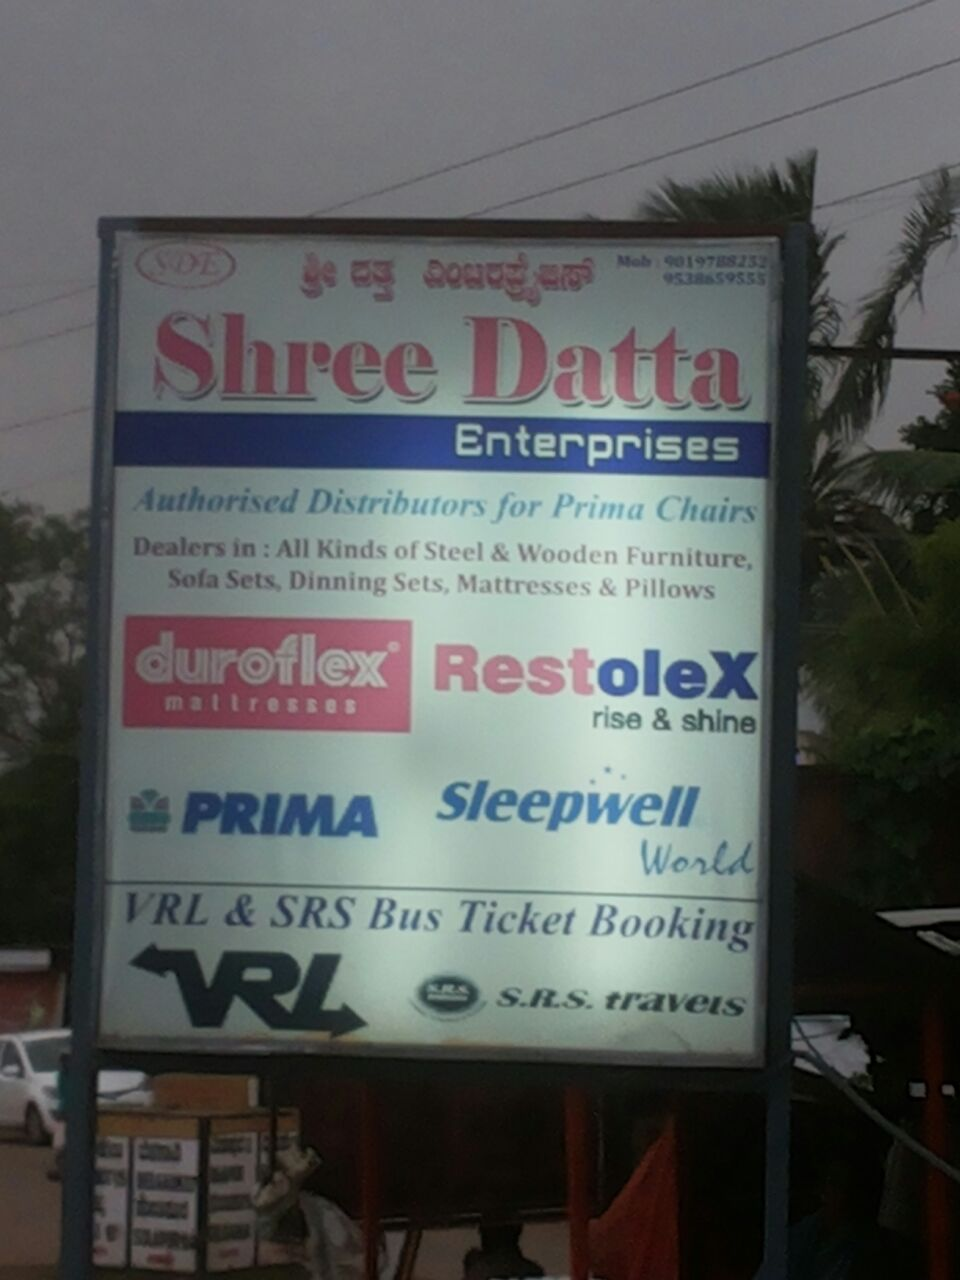 Shree Datta Enterprises